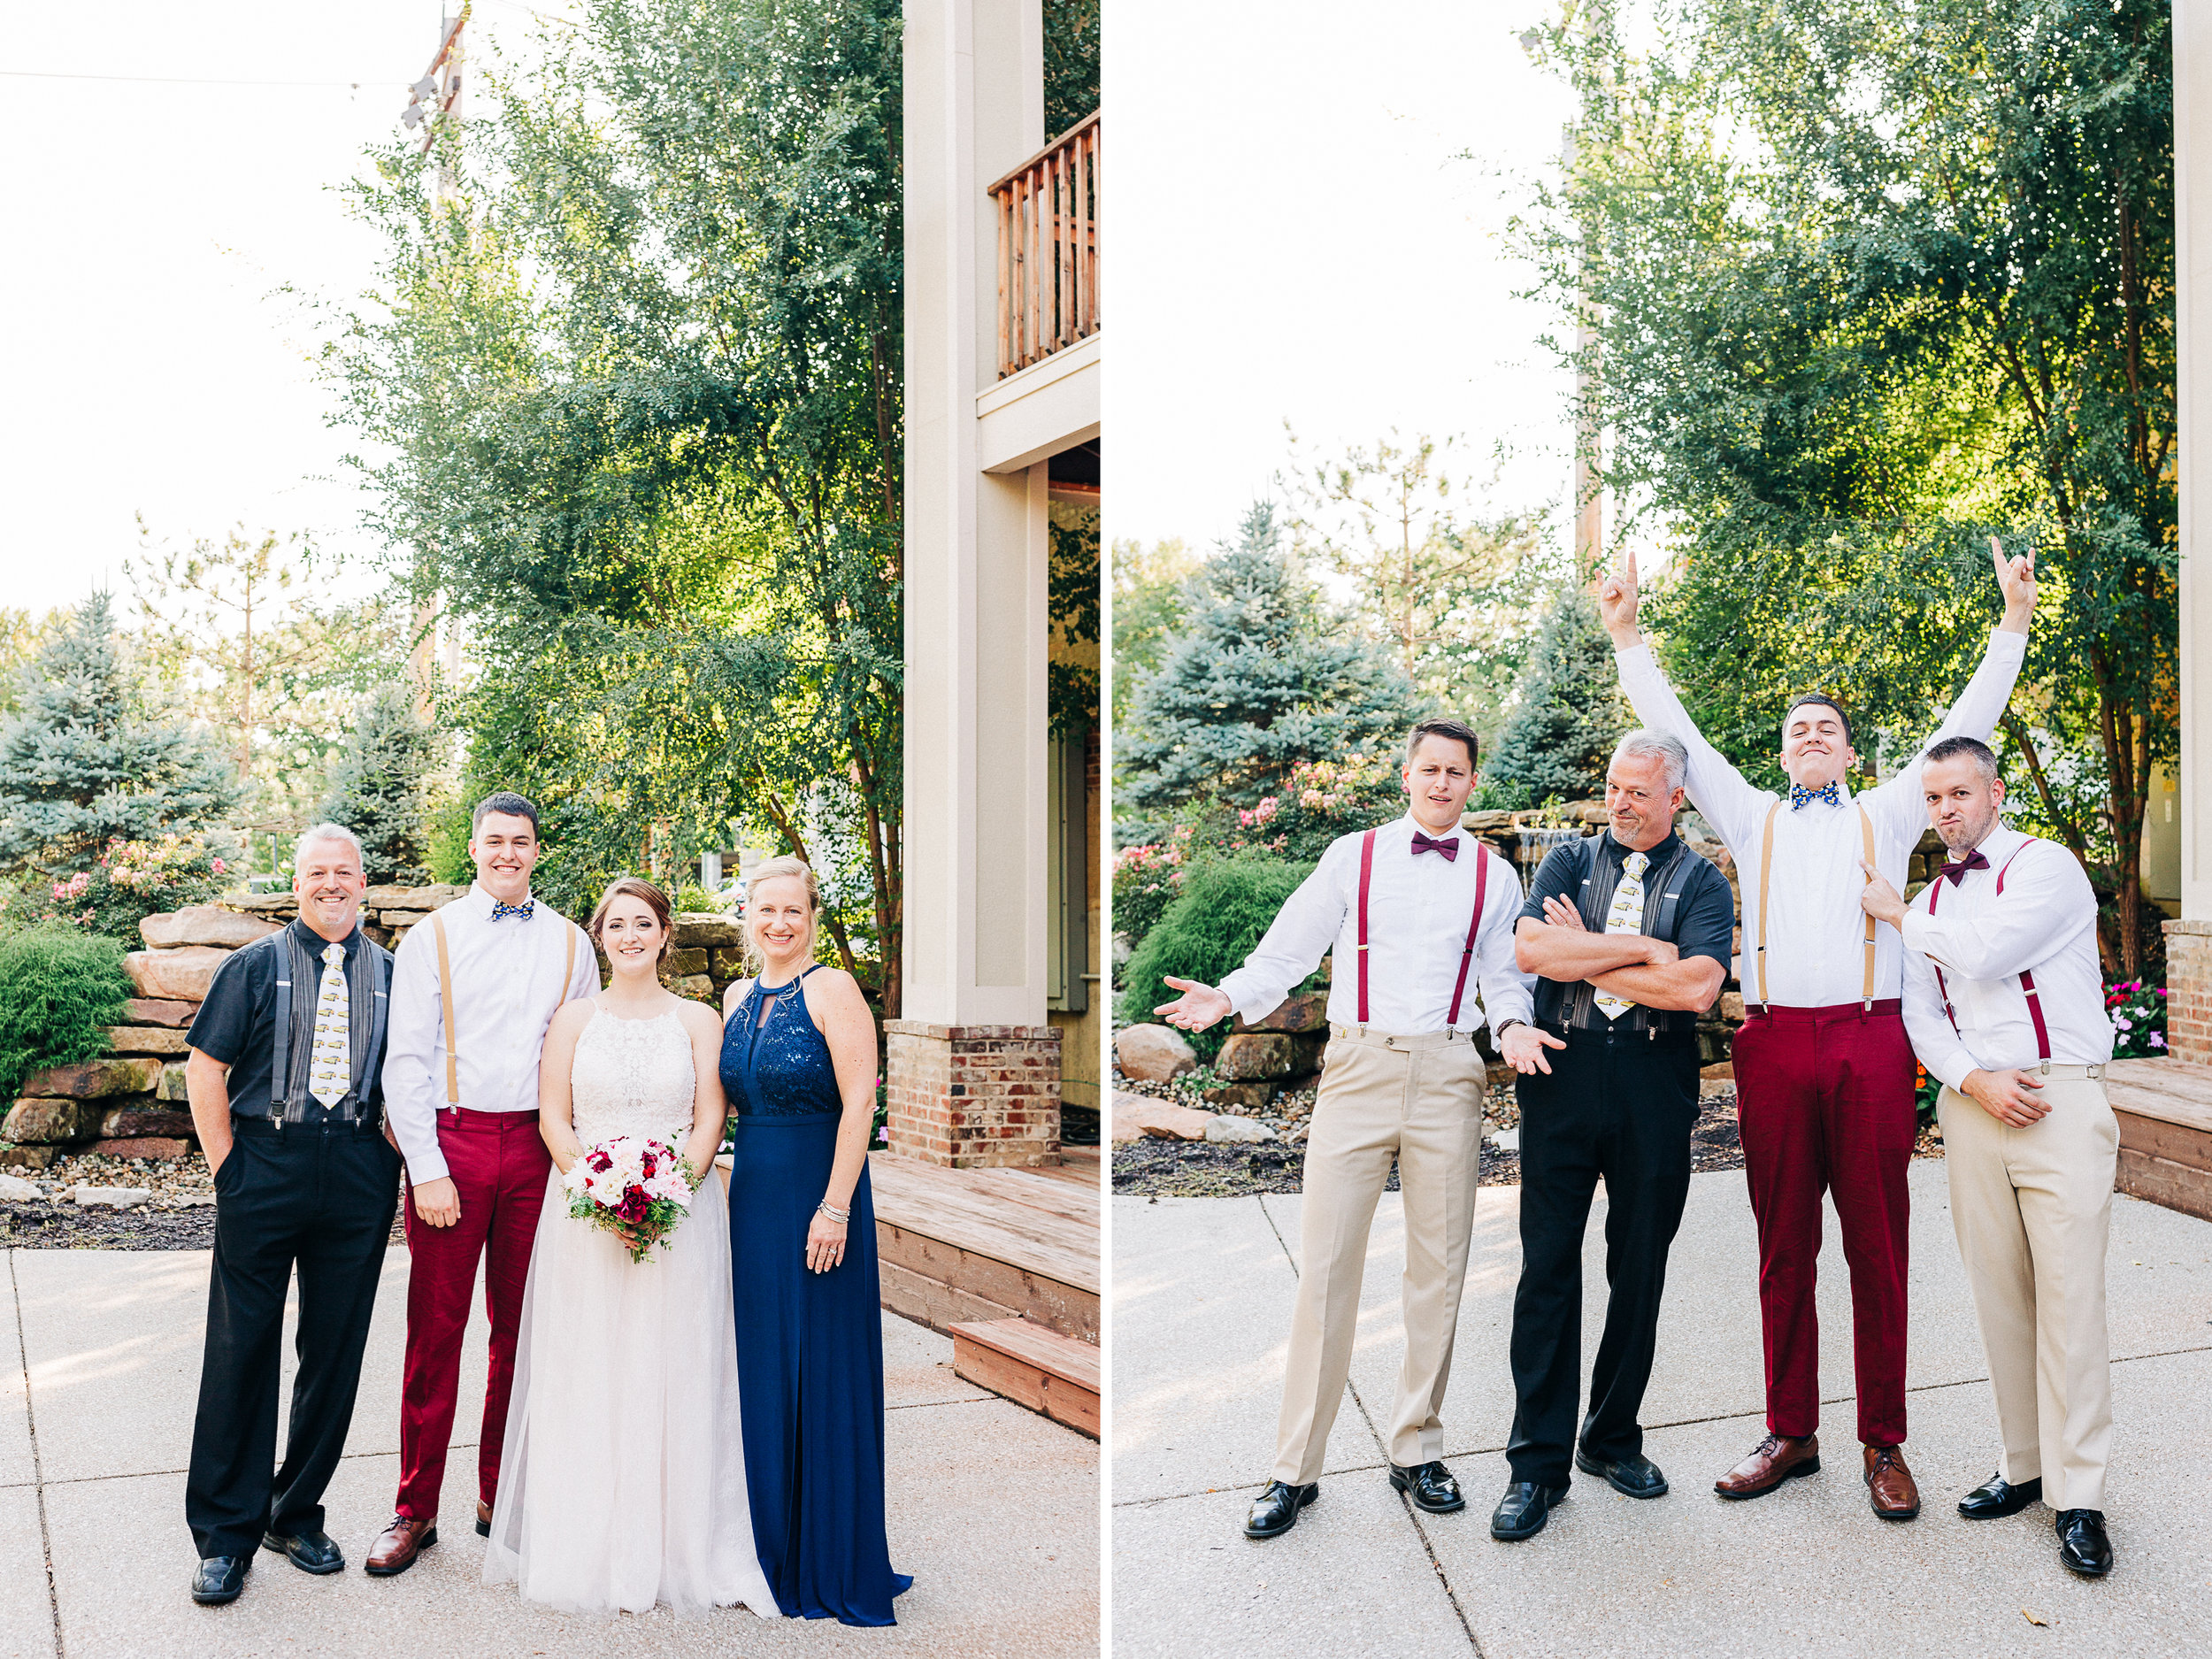 Dorothy_Louise_Photography_Eric_Fallon_La-Belle_Coeur_Main_Street_St_Charles_Wedding_Collage12.jpg